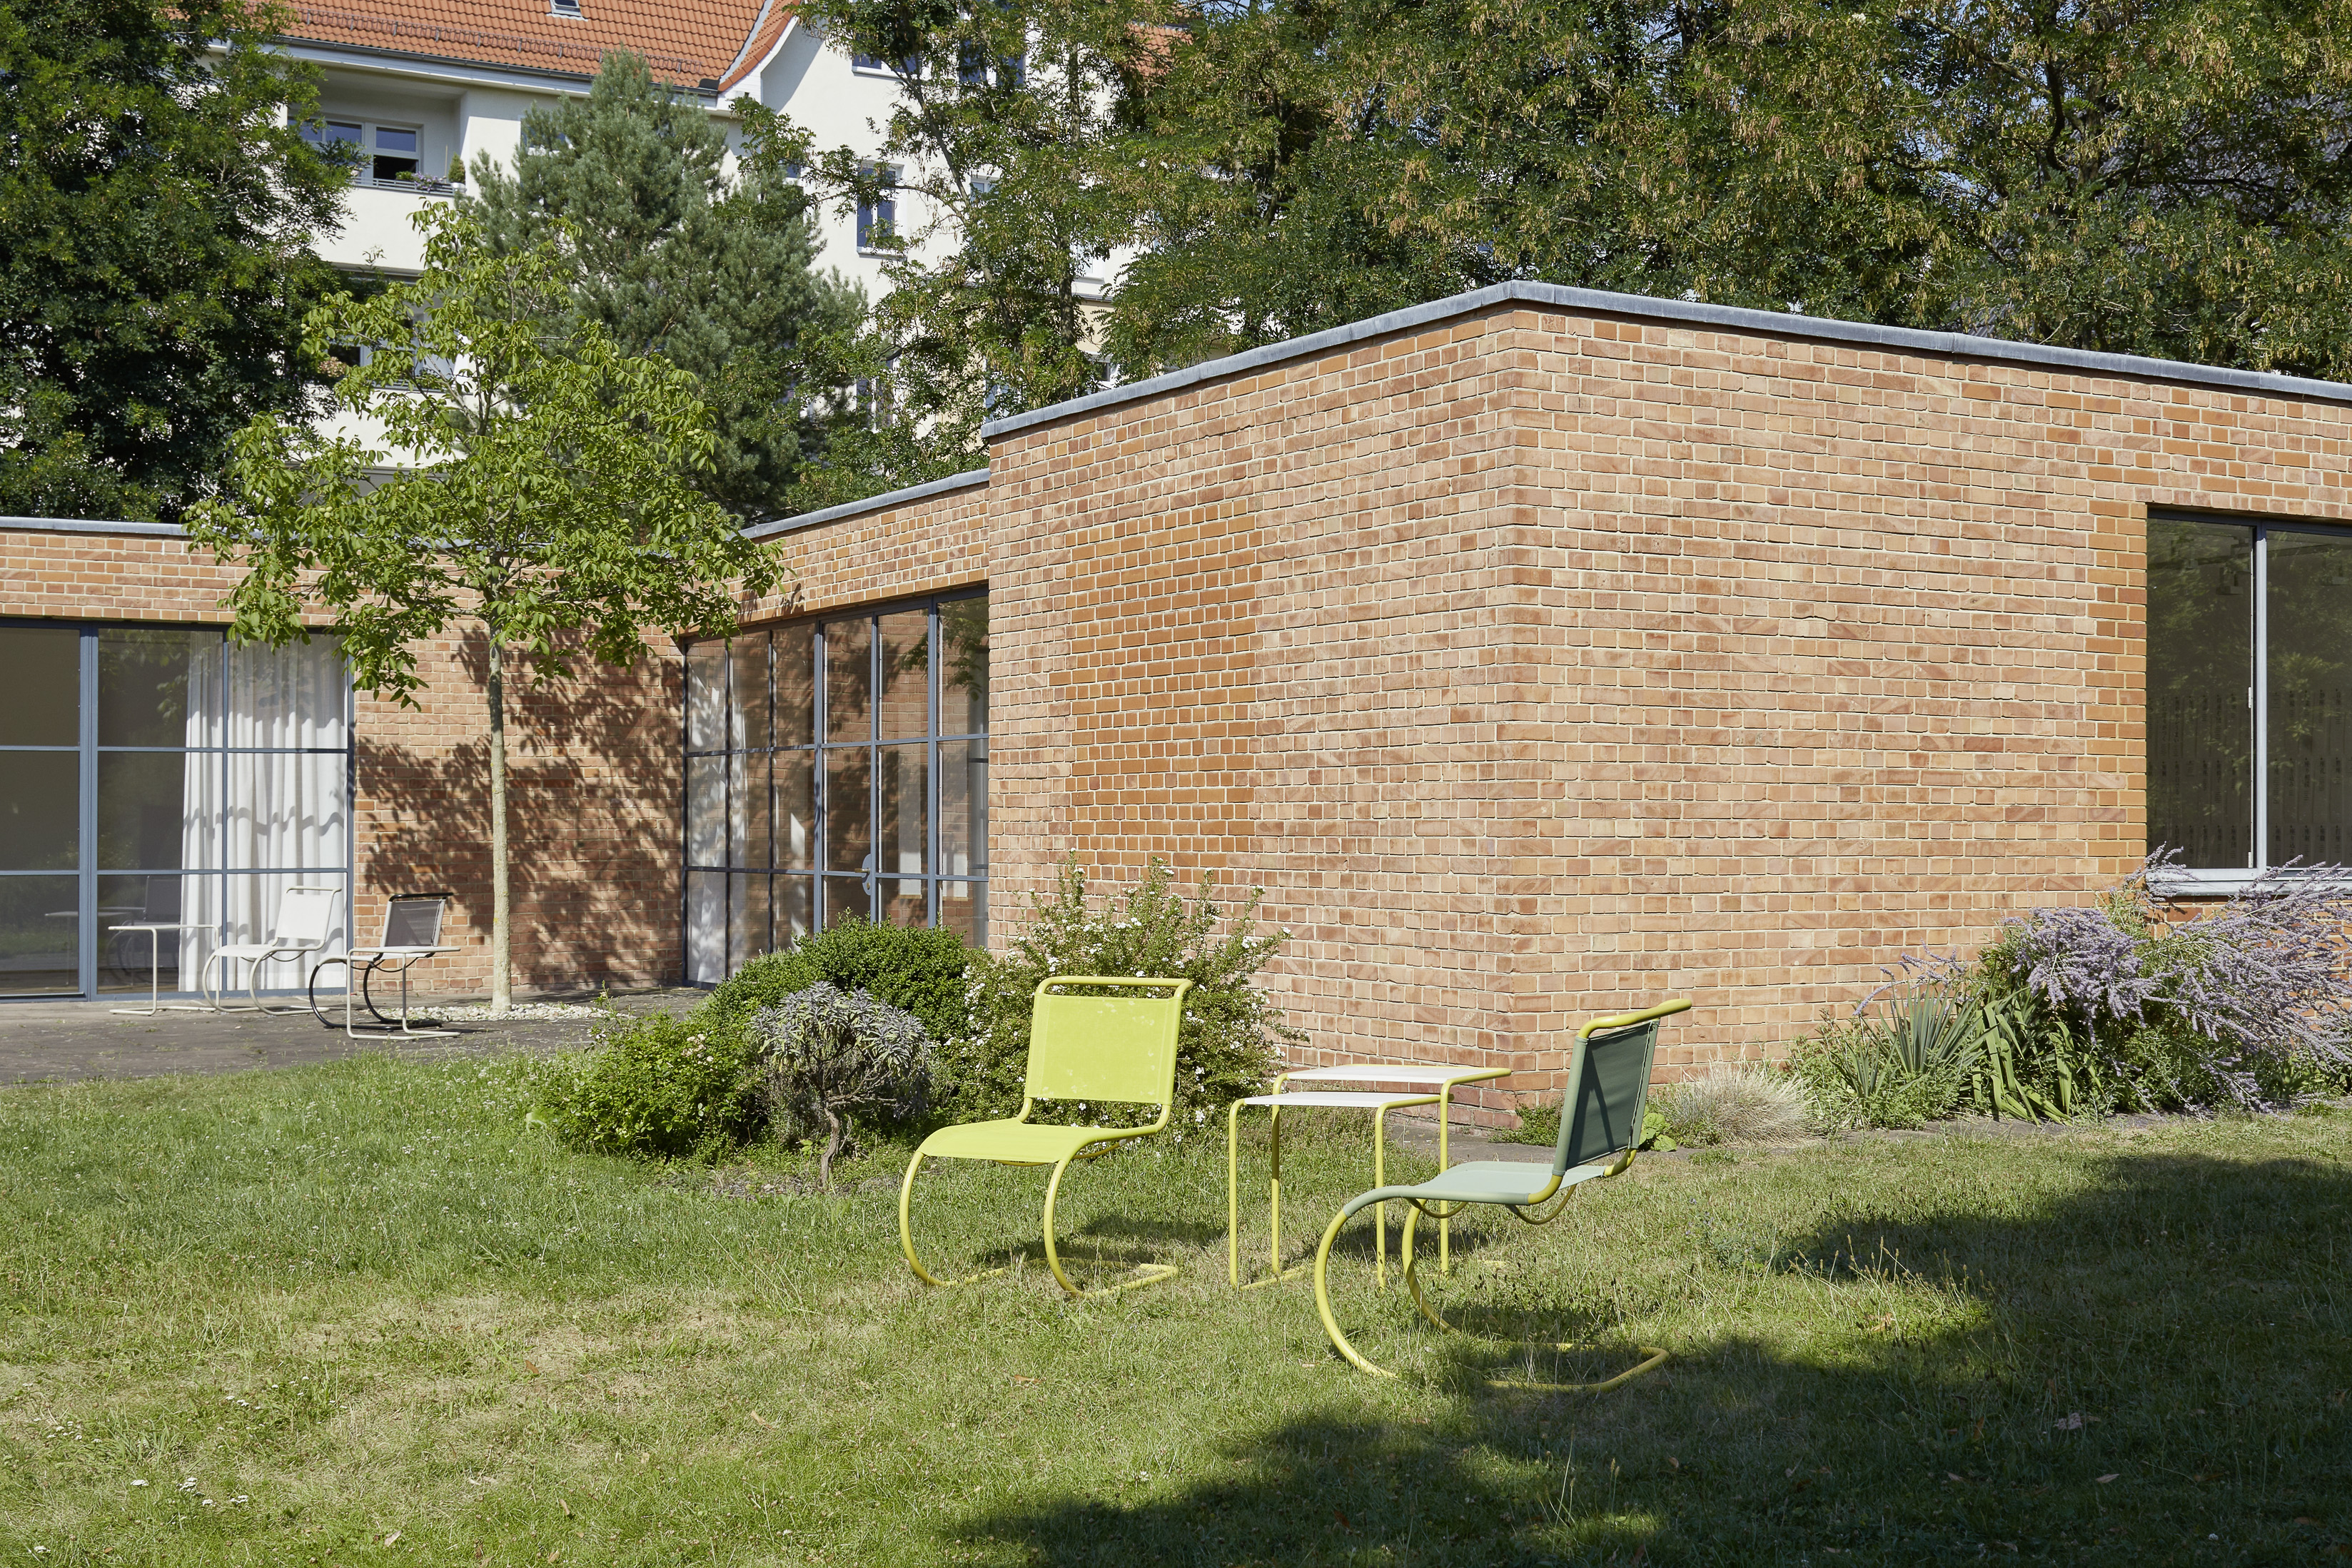 Mies van der Rohe Haus, Foto: Achim Hatzius 2019, Mies van der Rohe Haus